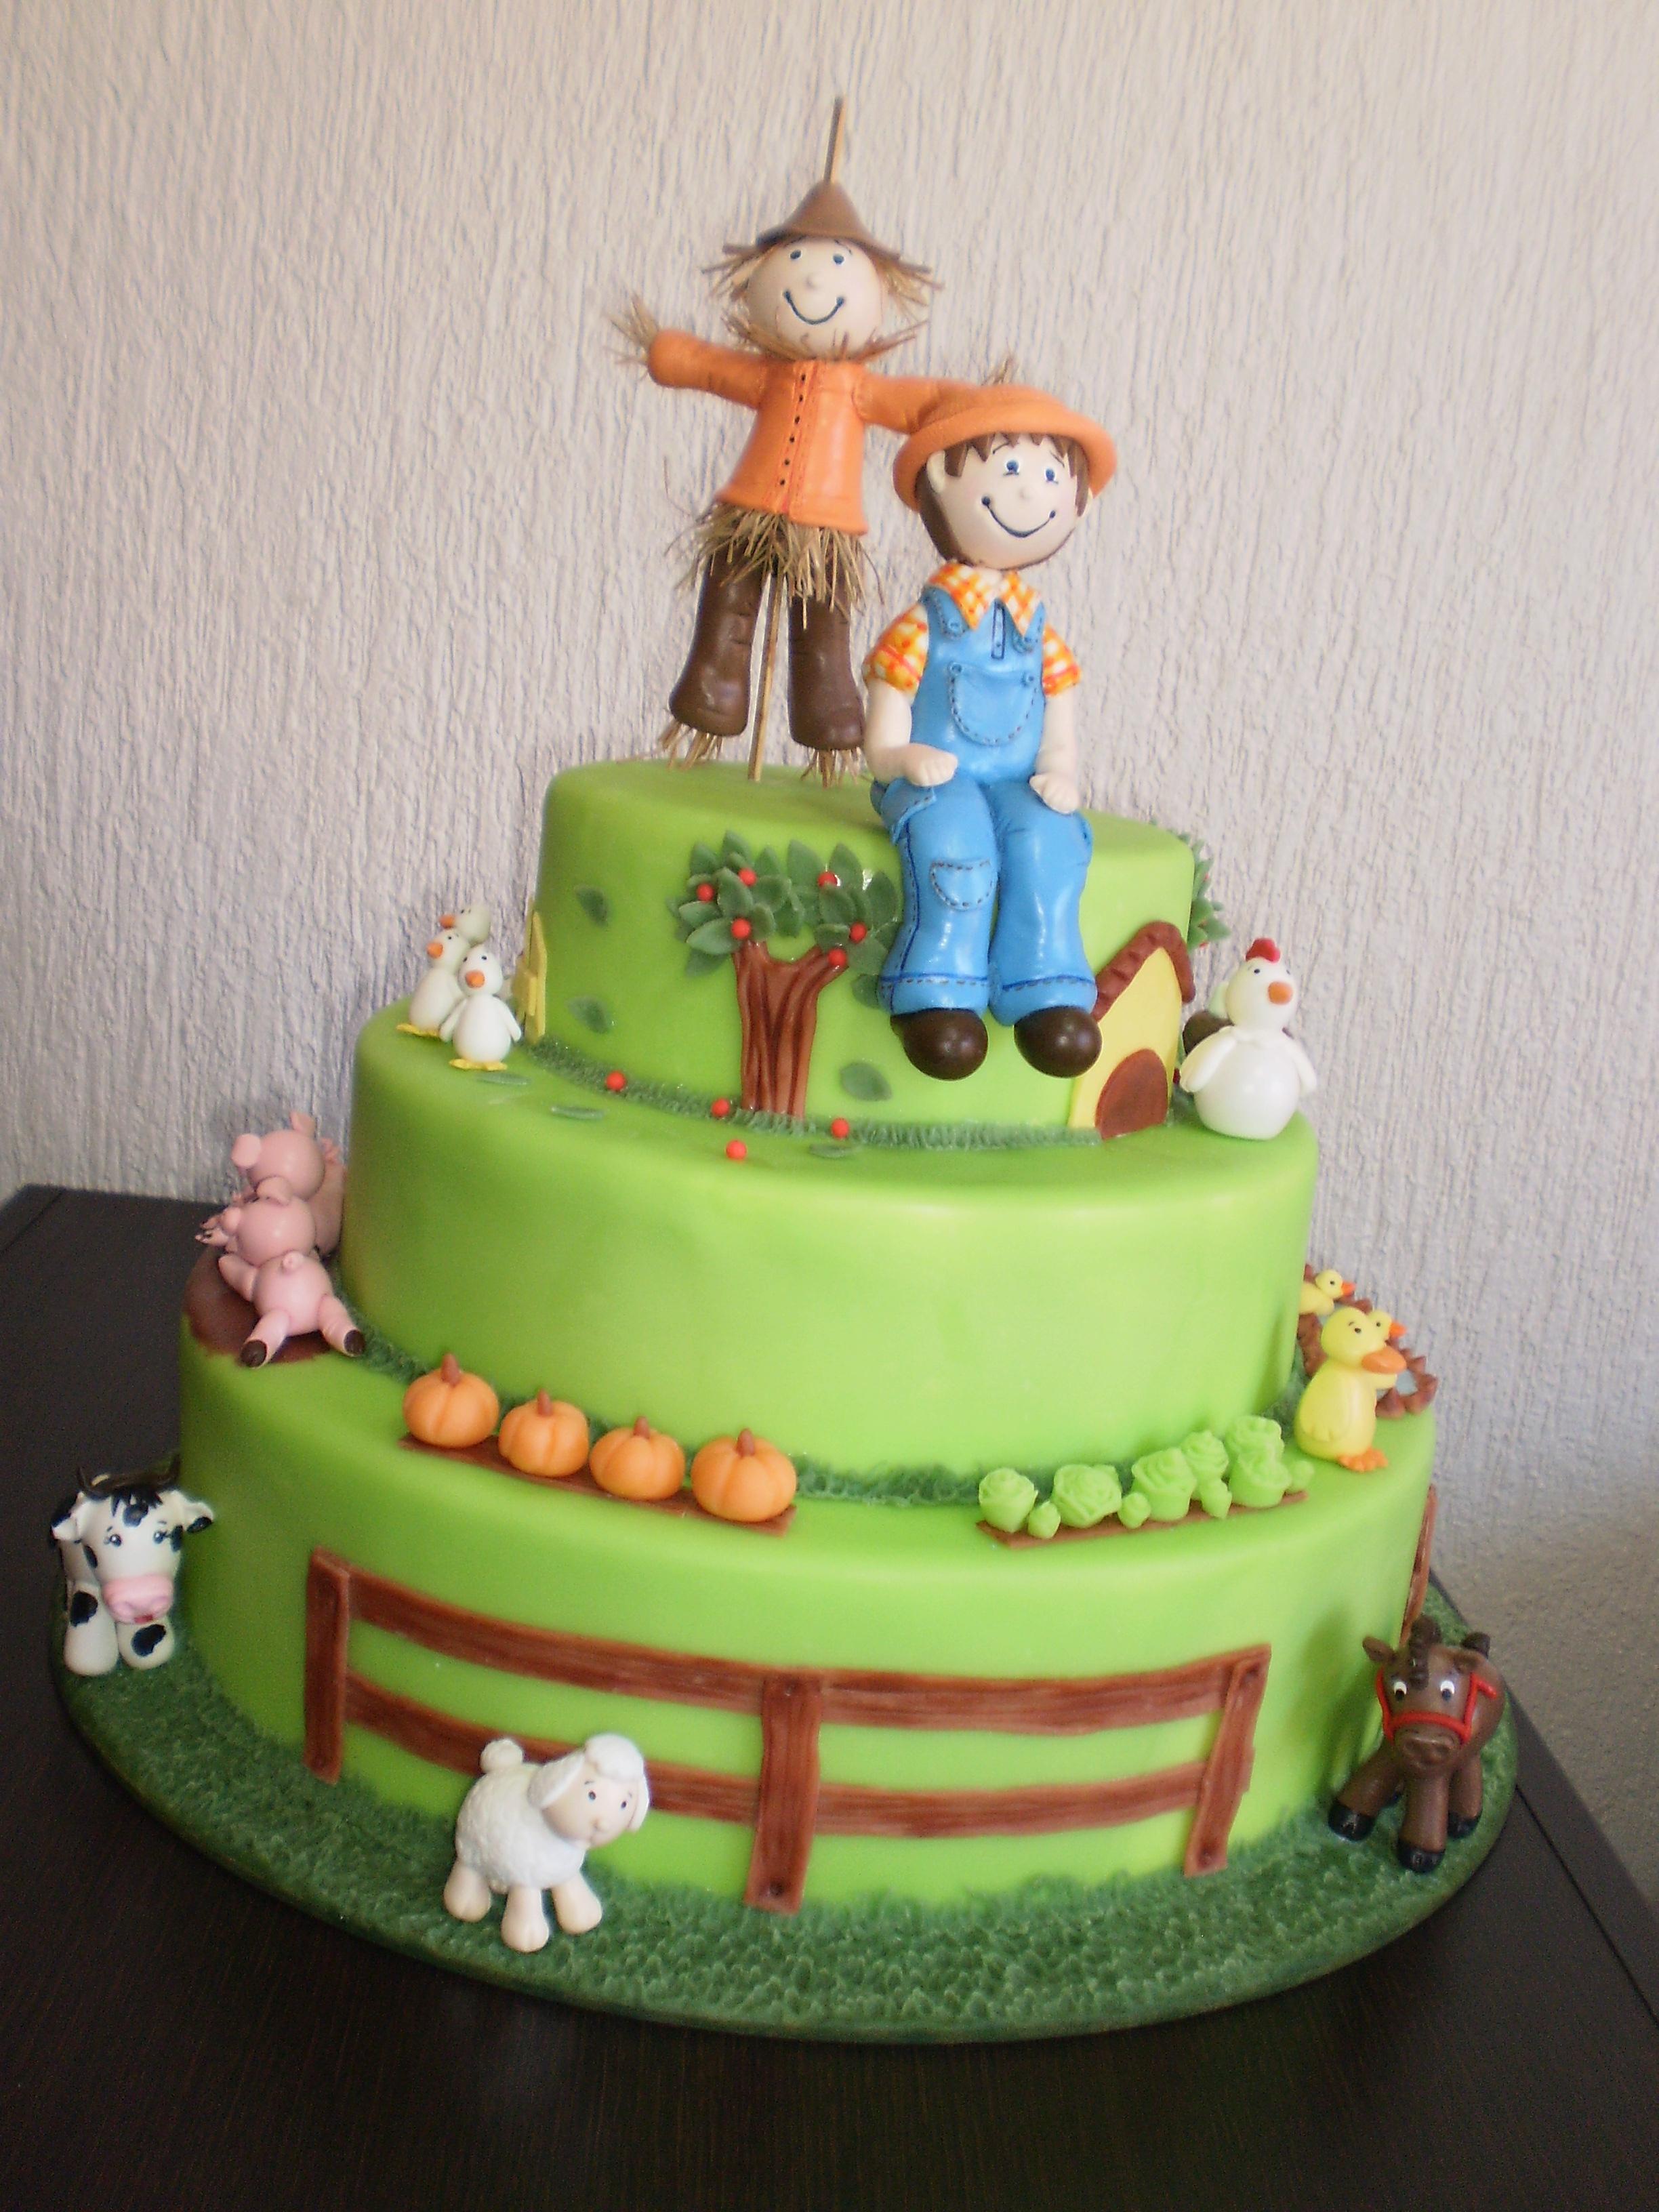 Bolo de Aniversario da Joaninha - Ladybug Cake - YouTube